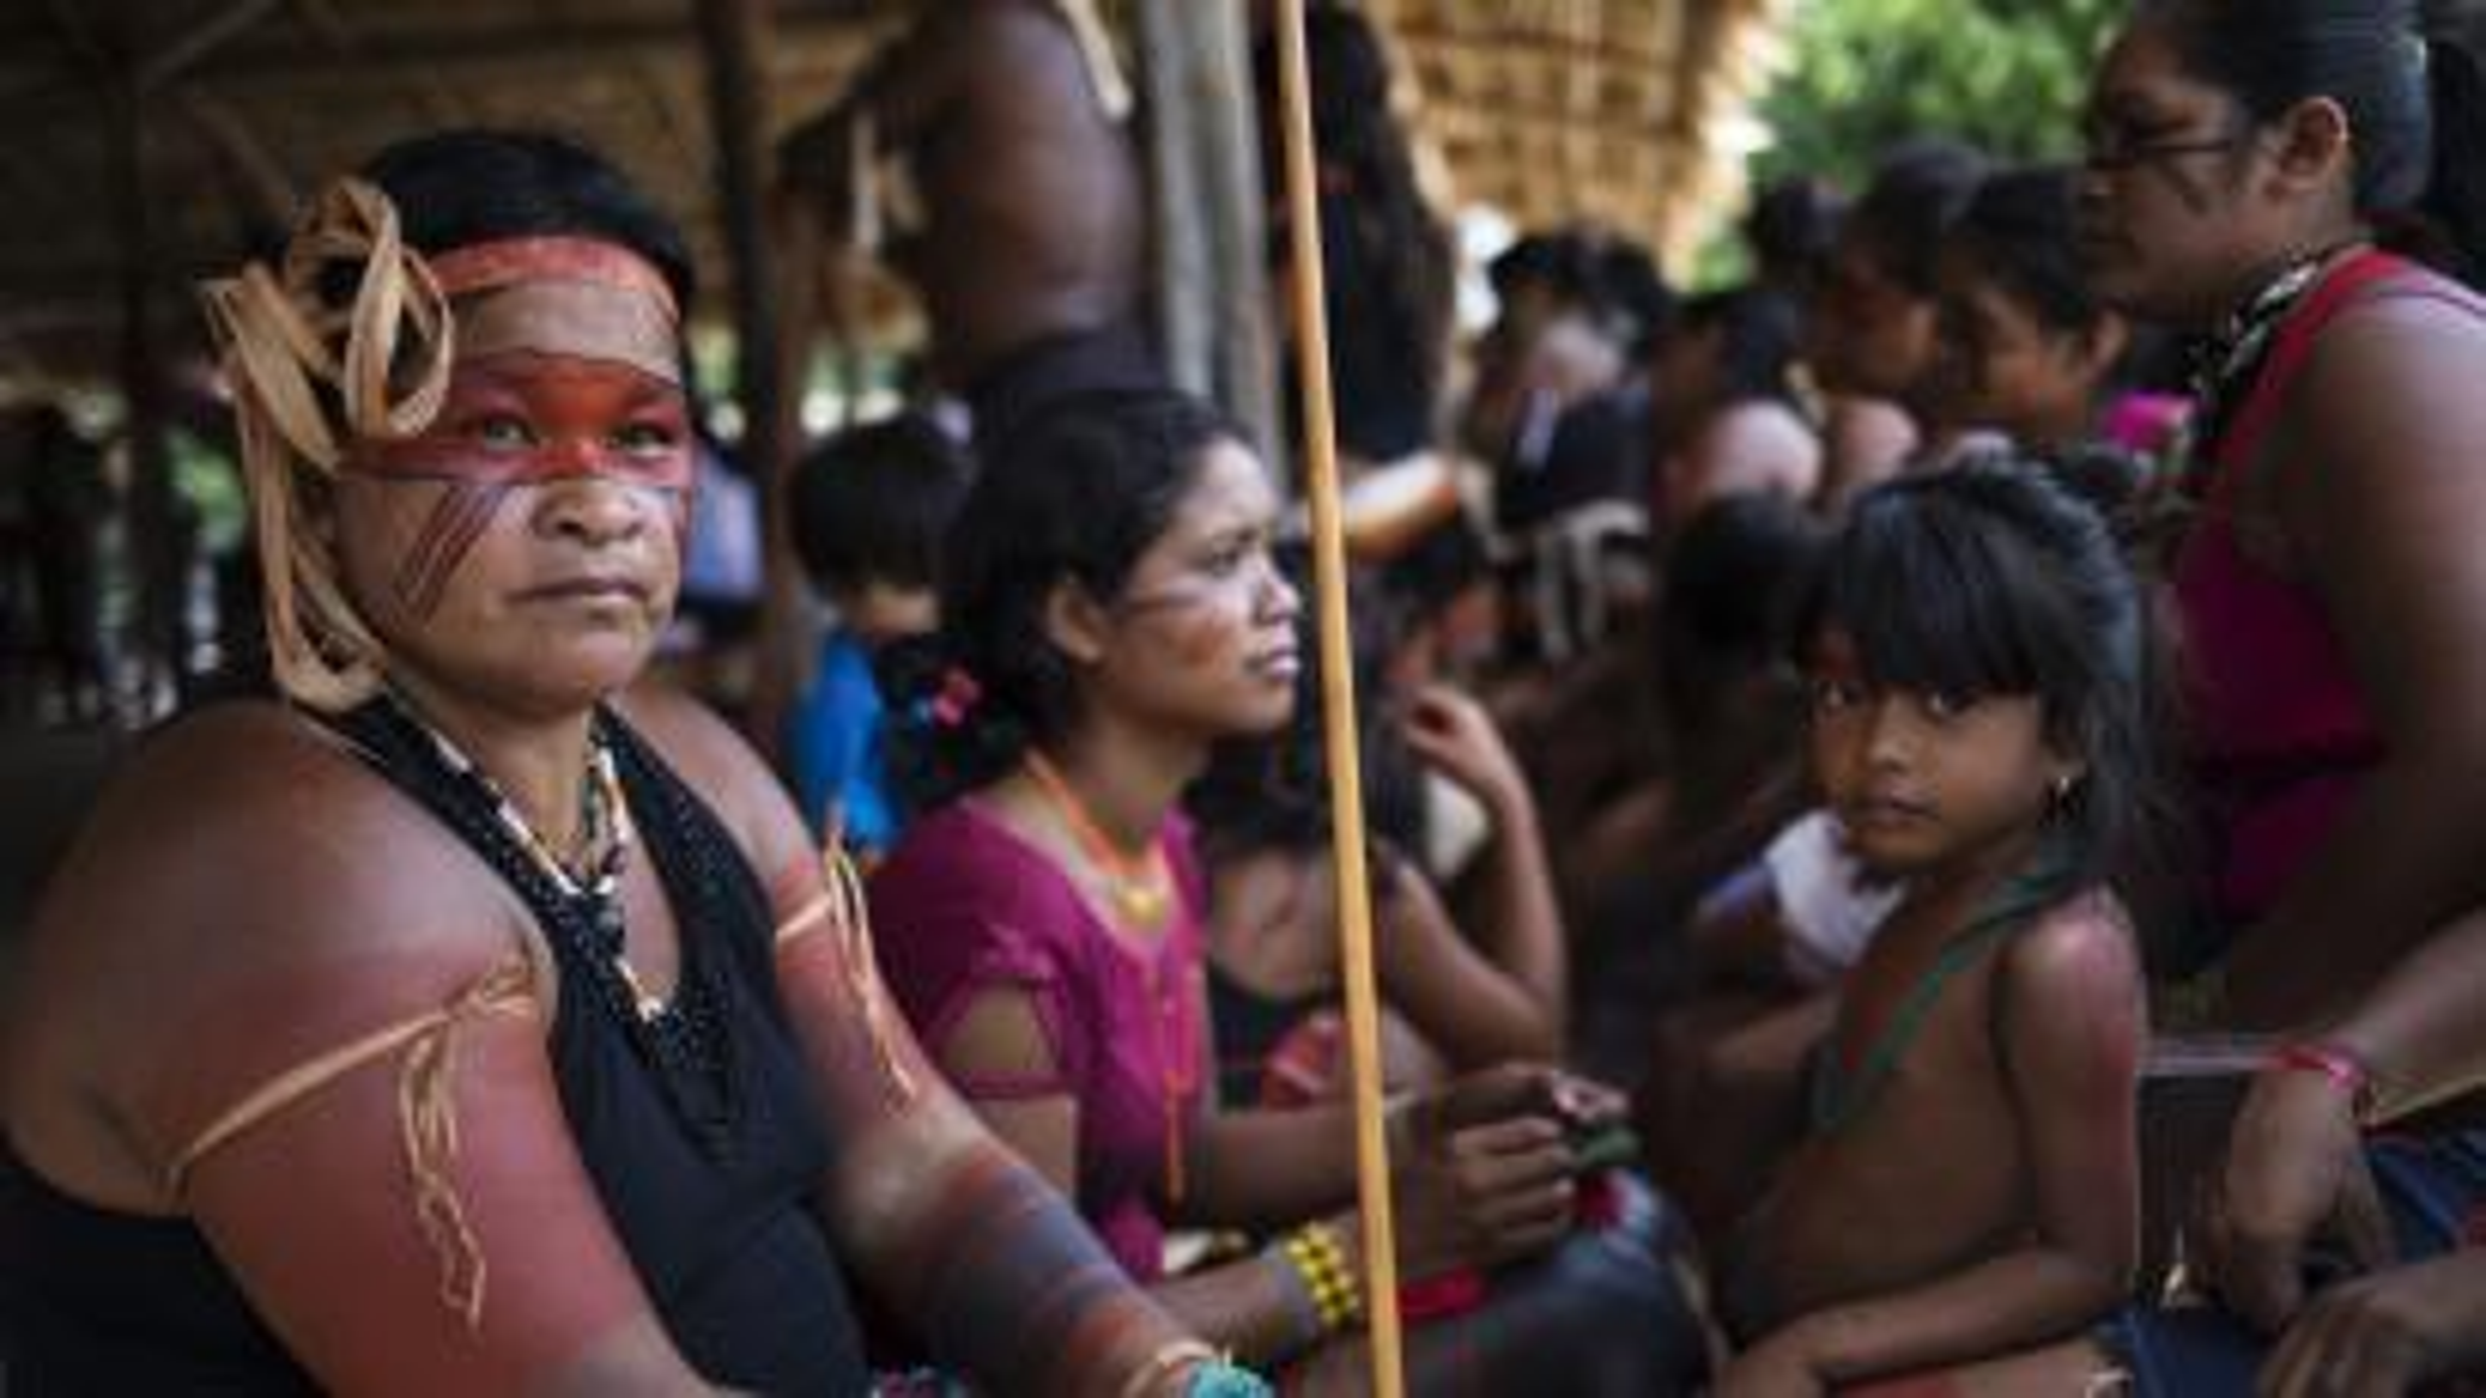 Brazil Amazon Indigenous community